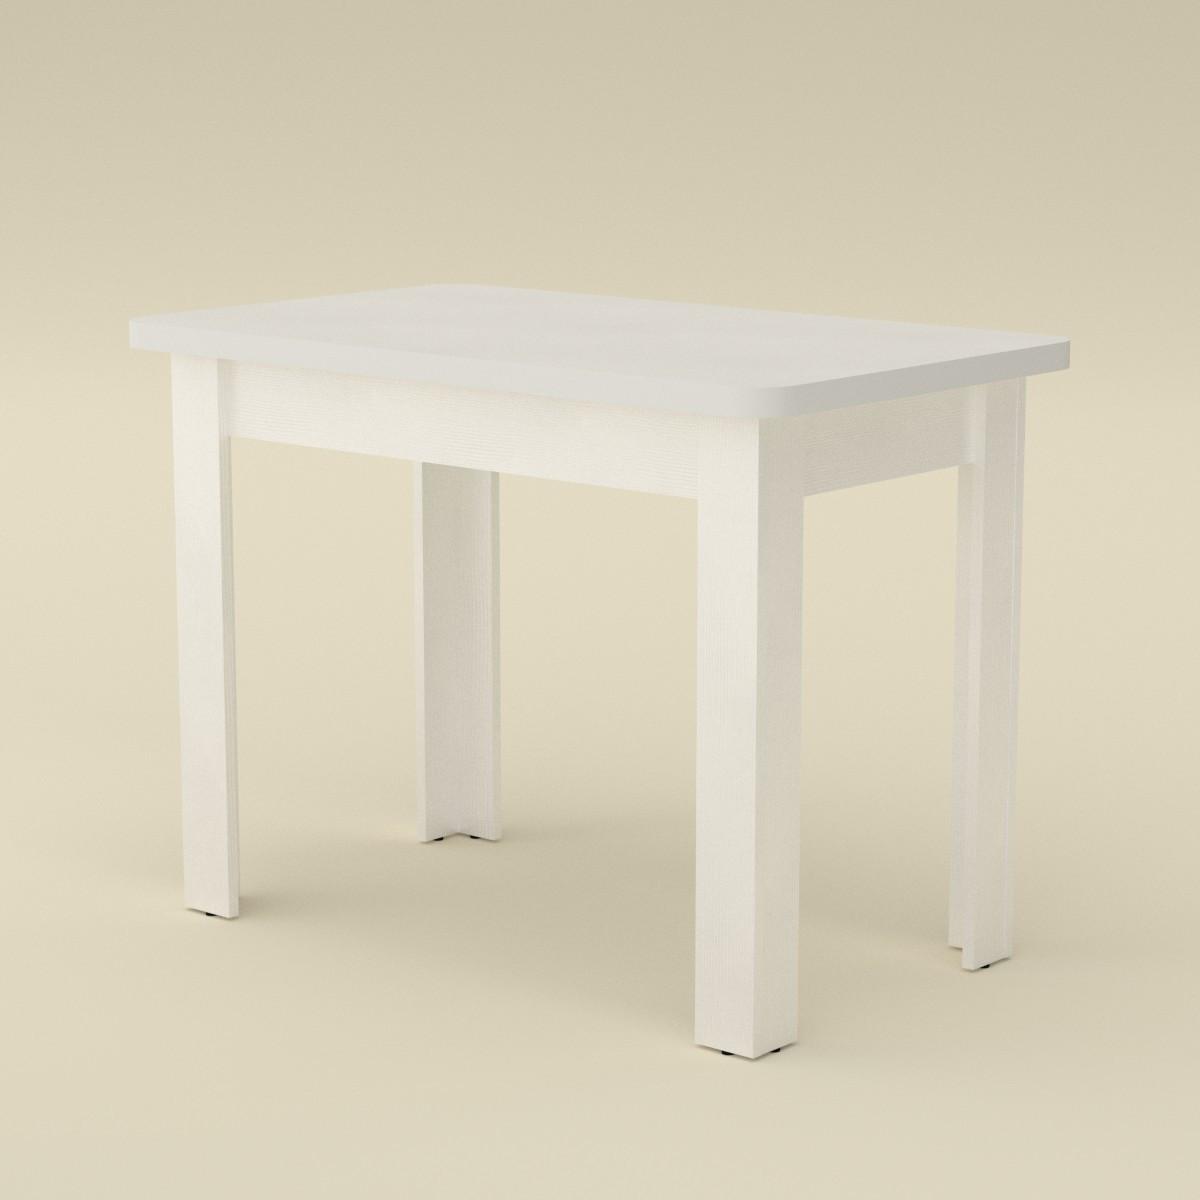 Стол кухонный КС-6 нимфея альба (белый) Компанит (100х60х74 см)